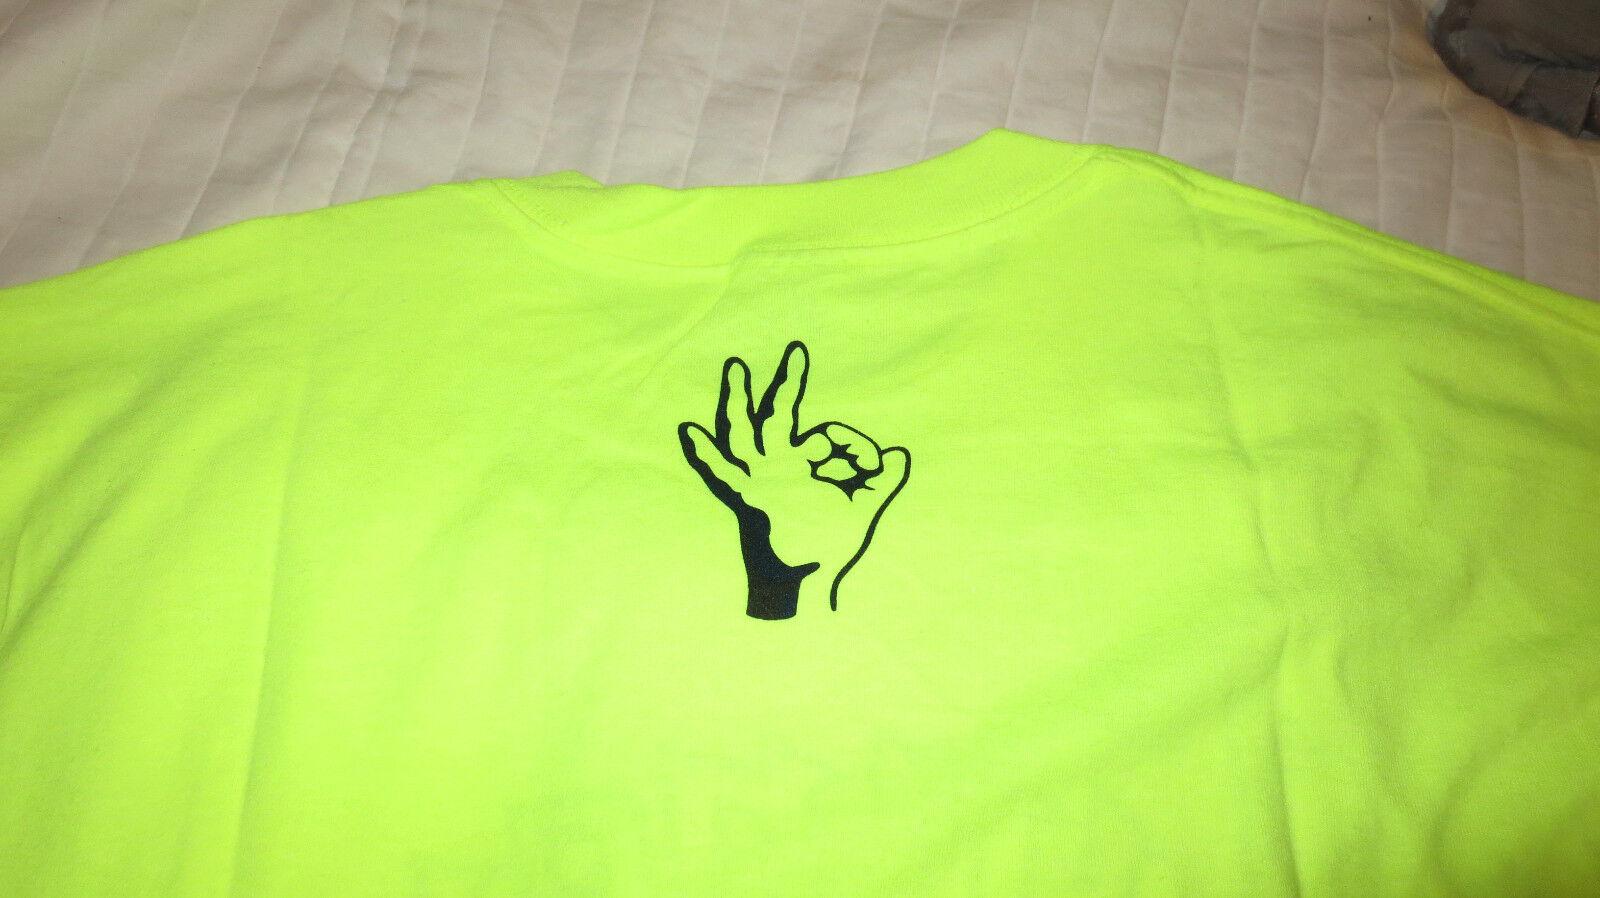 WINNER'S CIRCLE OKAY XL Uomo'S giallo TEE T-SHIRT NEON giallo Uomo'S SKATEBOARDING SHORT SLEEVE f8427f